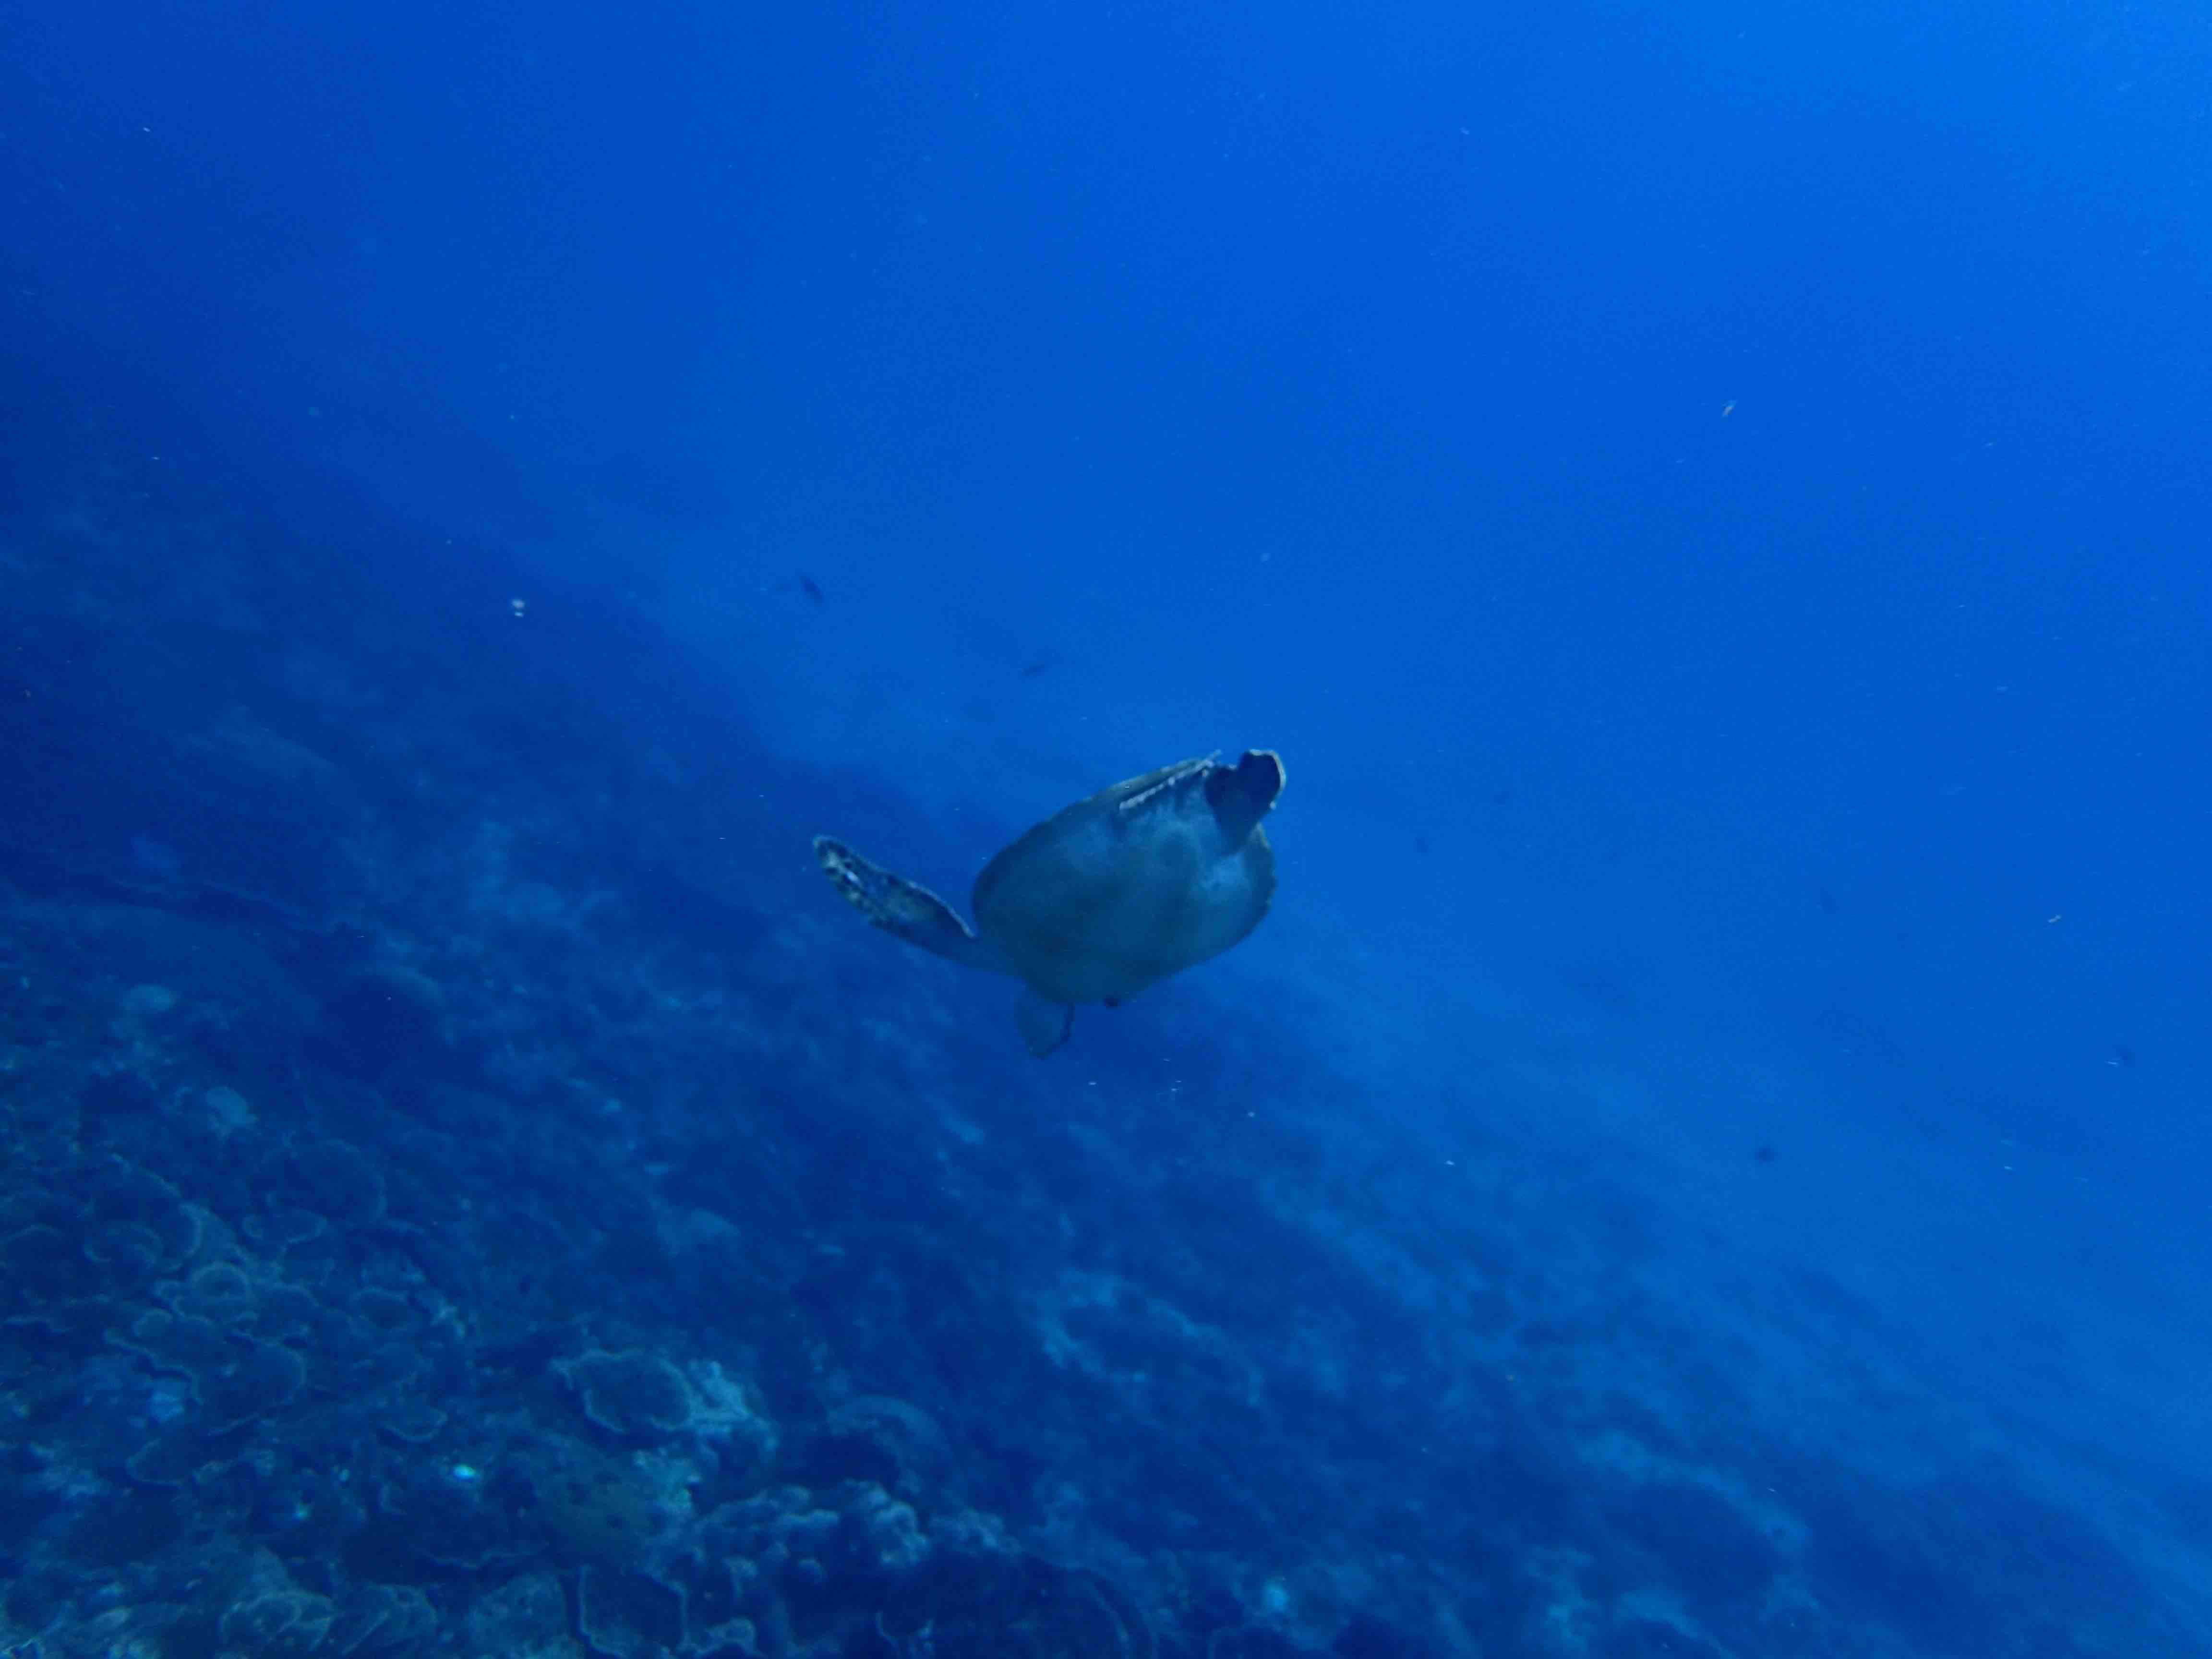 http://www.aquamarine-dive.net/blog/index.html/2015/09/11/P5260238.jpg